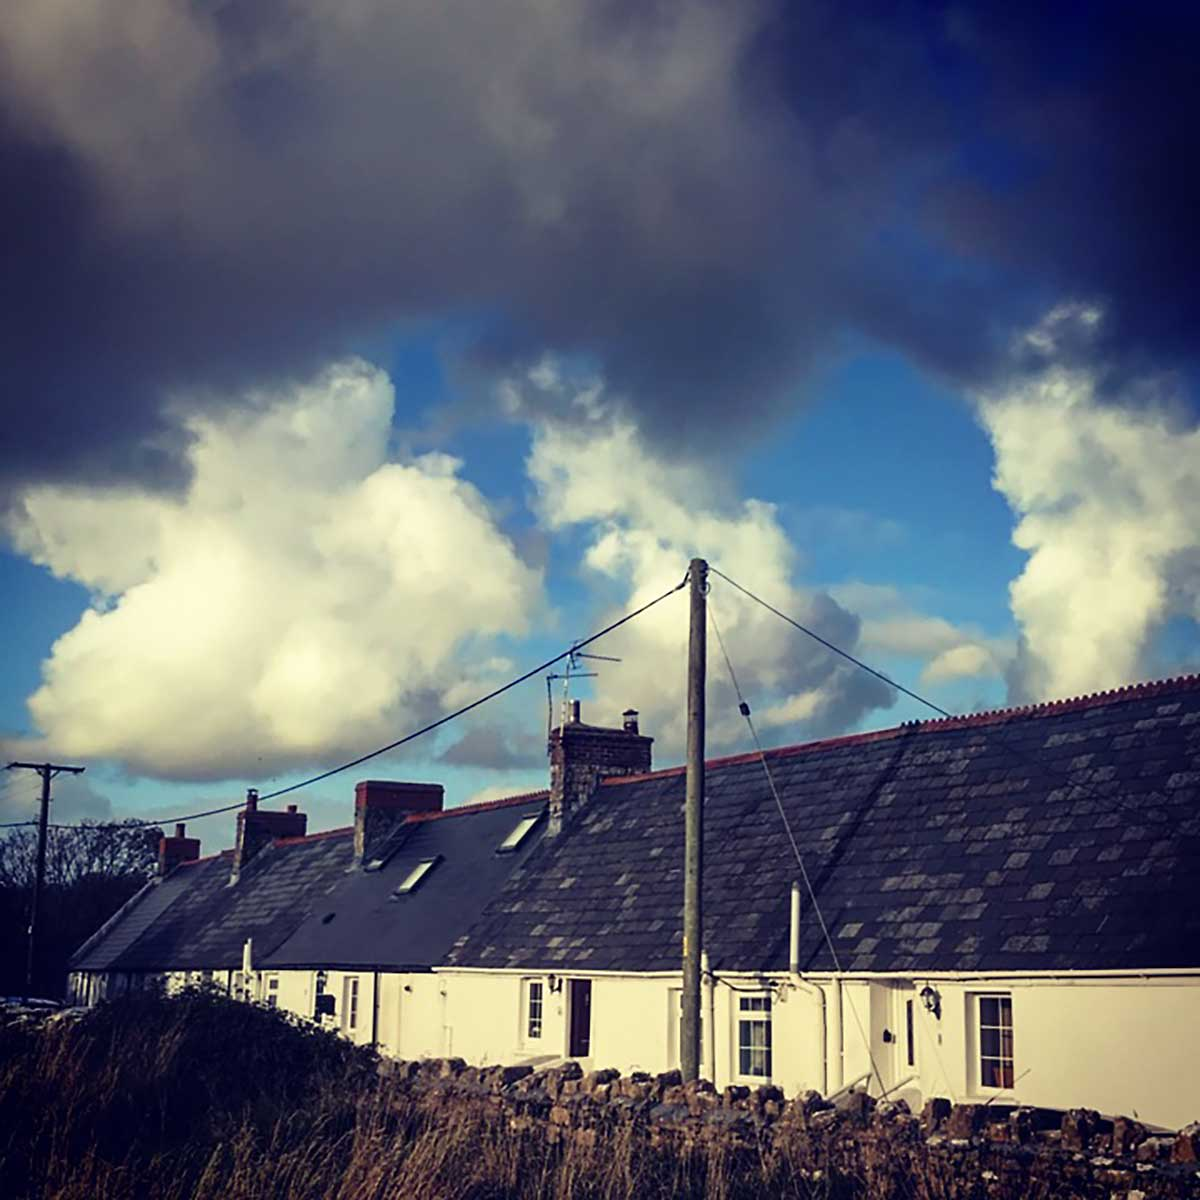 October clouds over Llantwit Major, 2017